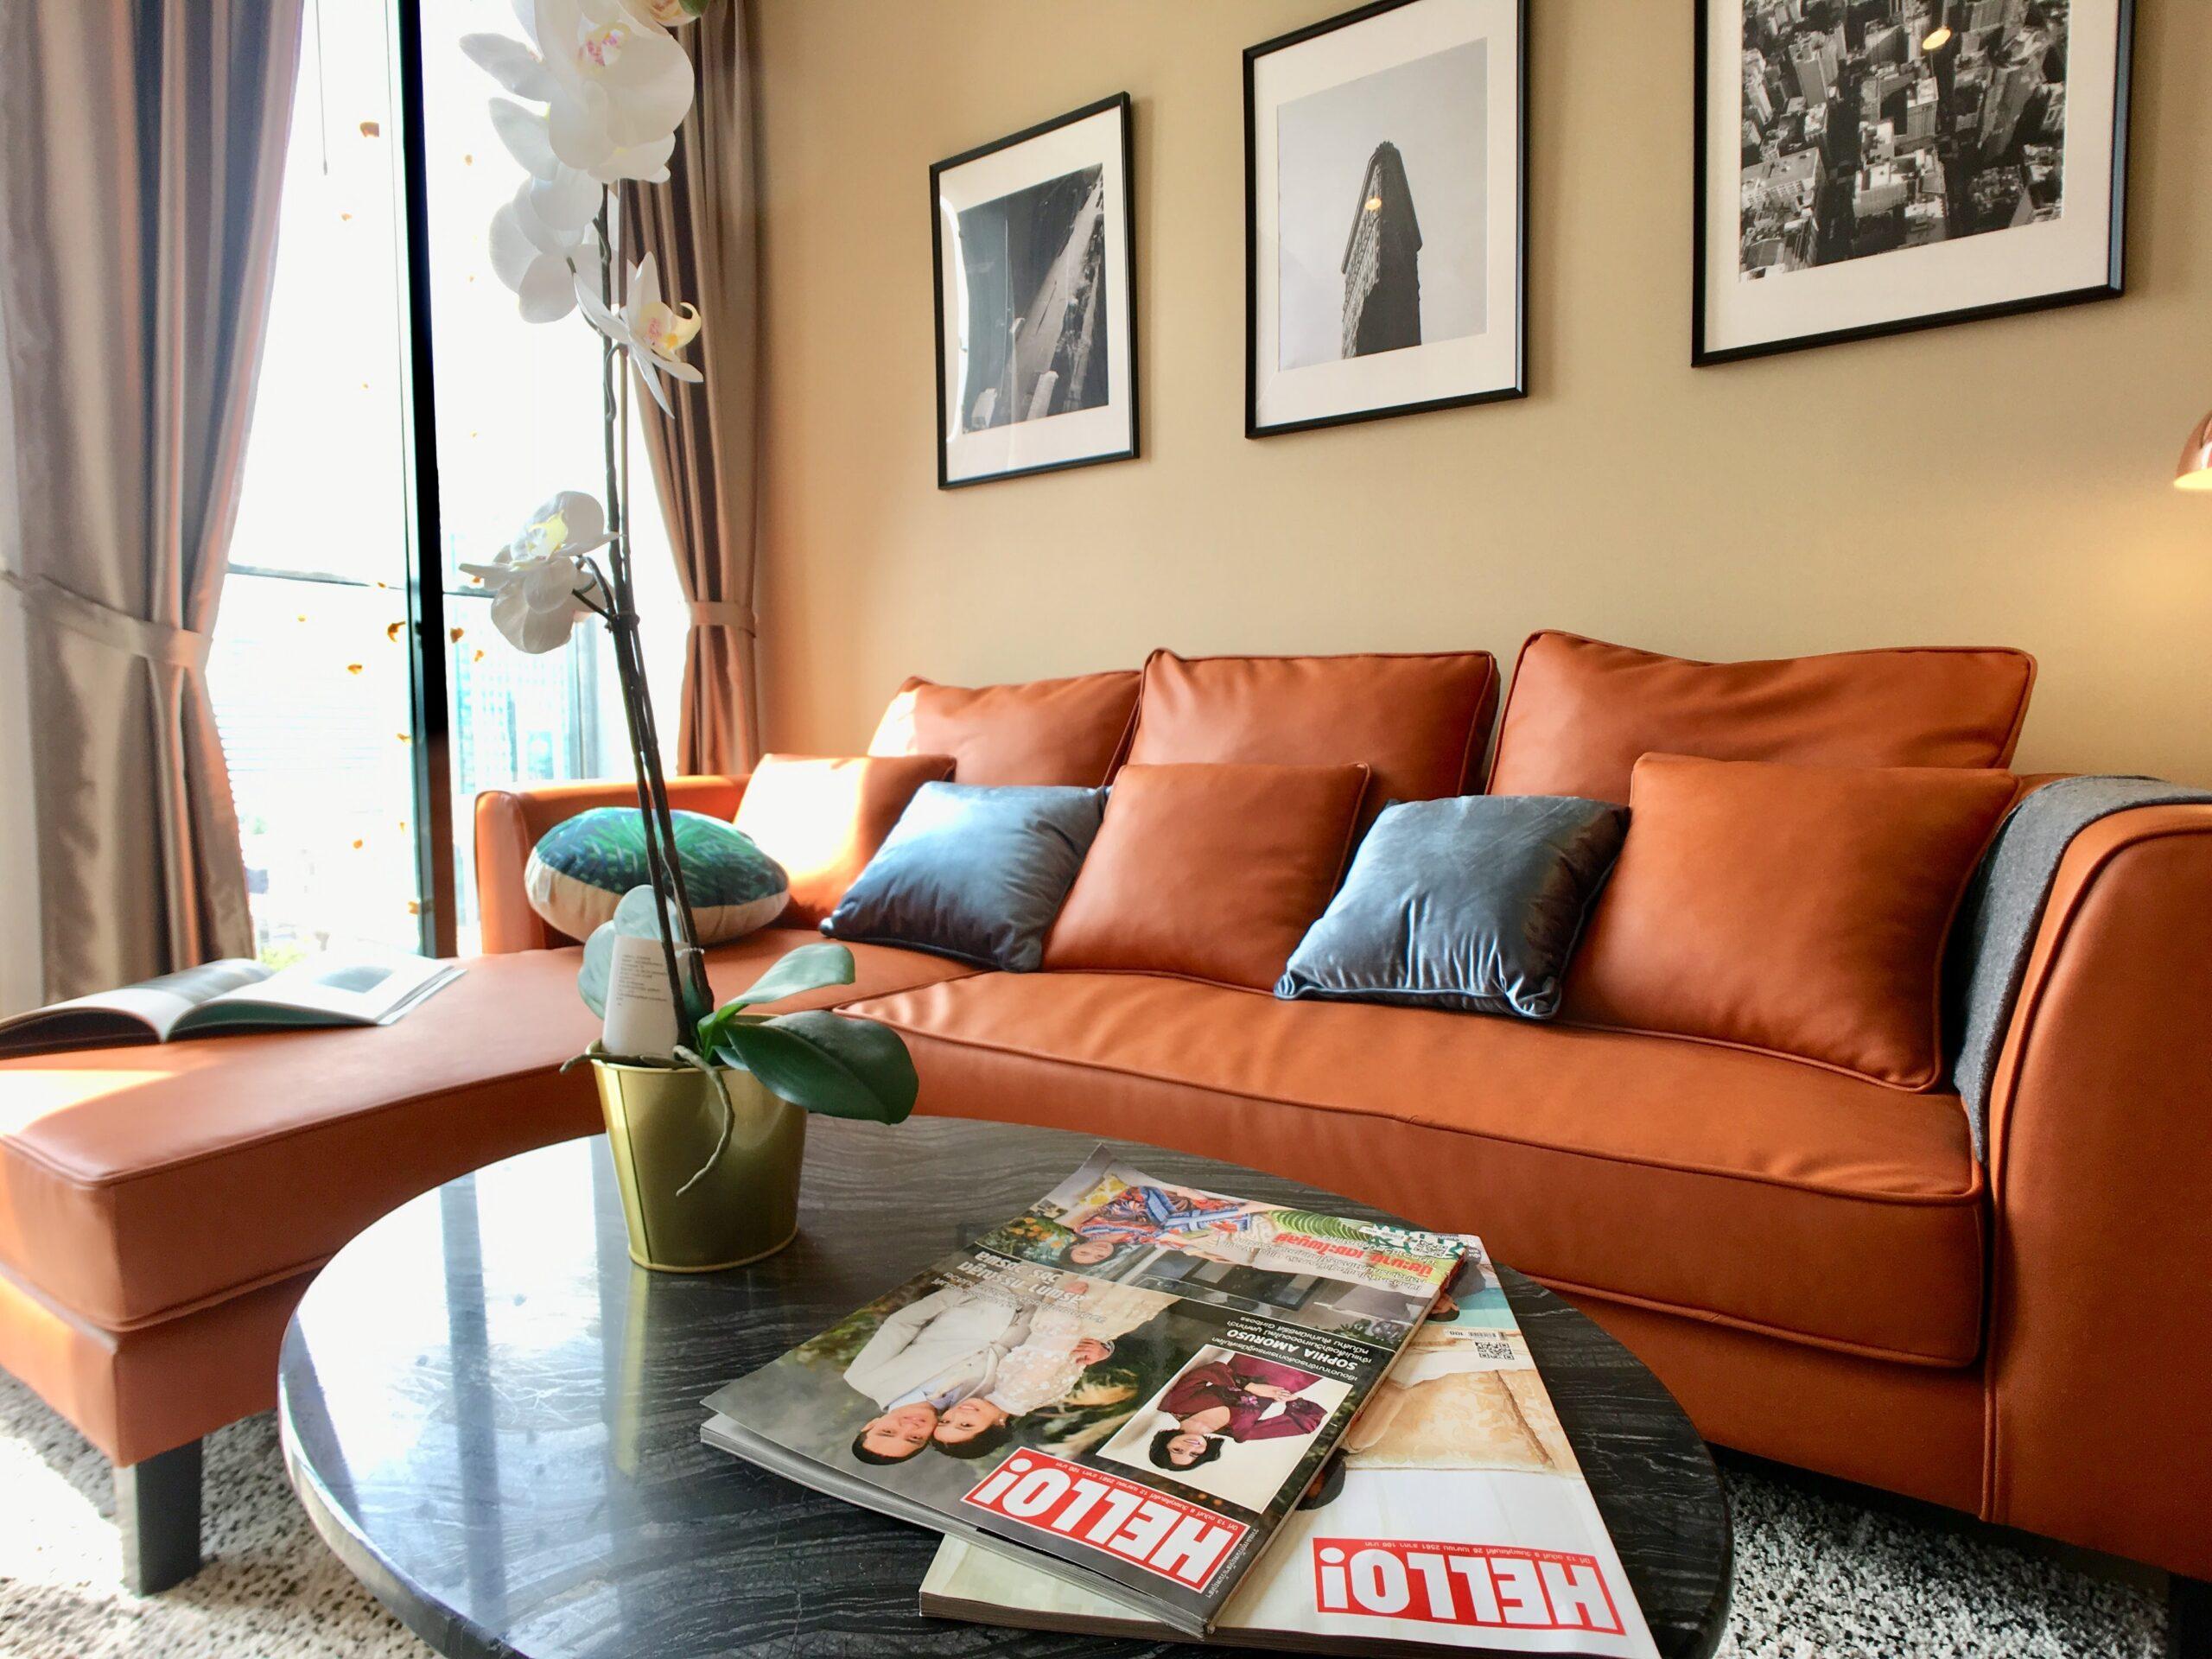 Bangkok Property Condo Apartment House Real Estate For Rent in Ploenchit Sukhumvit Lovely Bright Condo